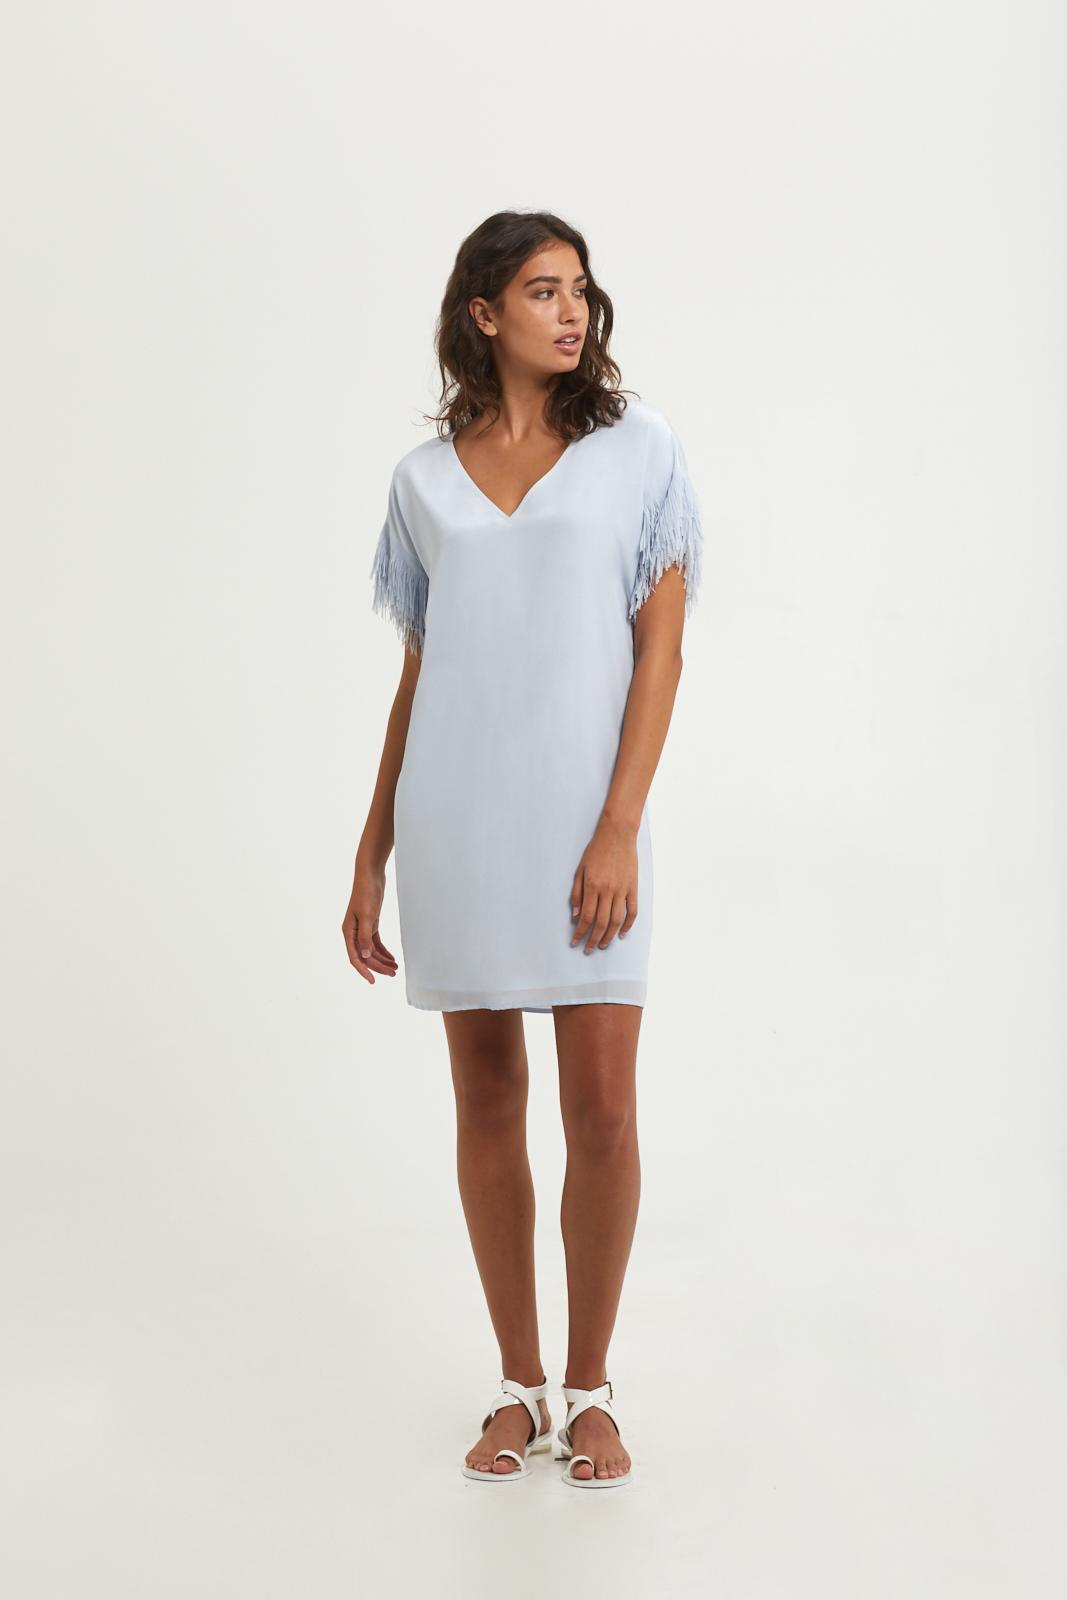 Edited - Final Select - Andi Fringe Dress - Powder Blue - 201-281_Front